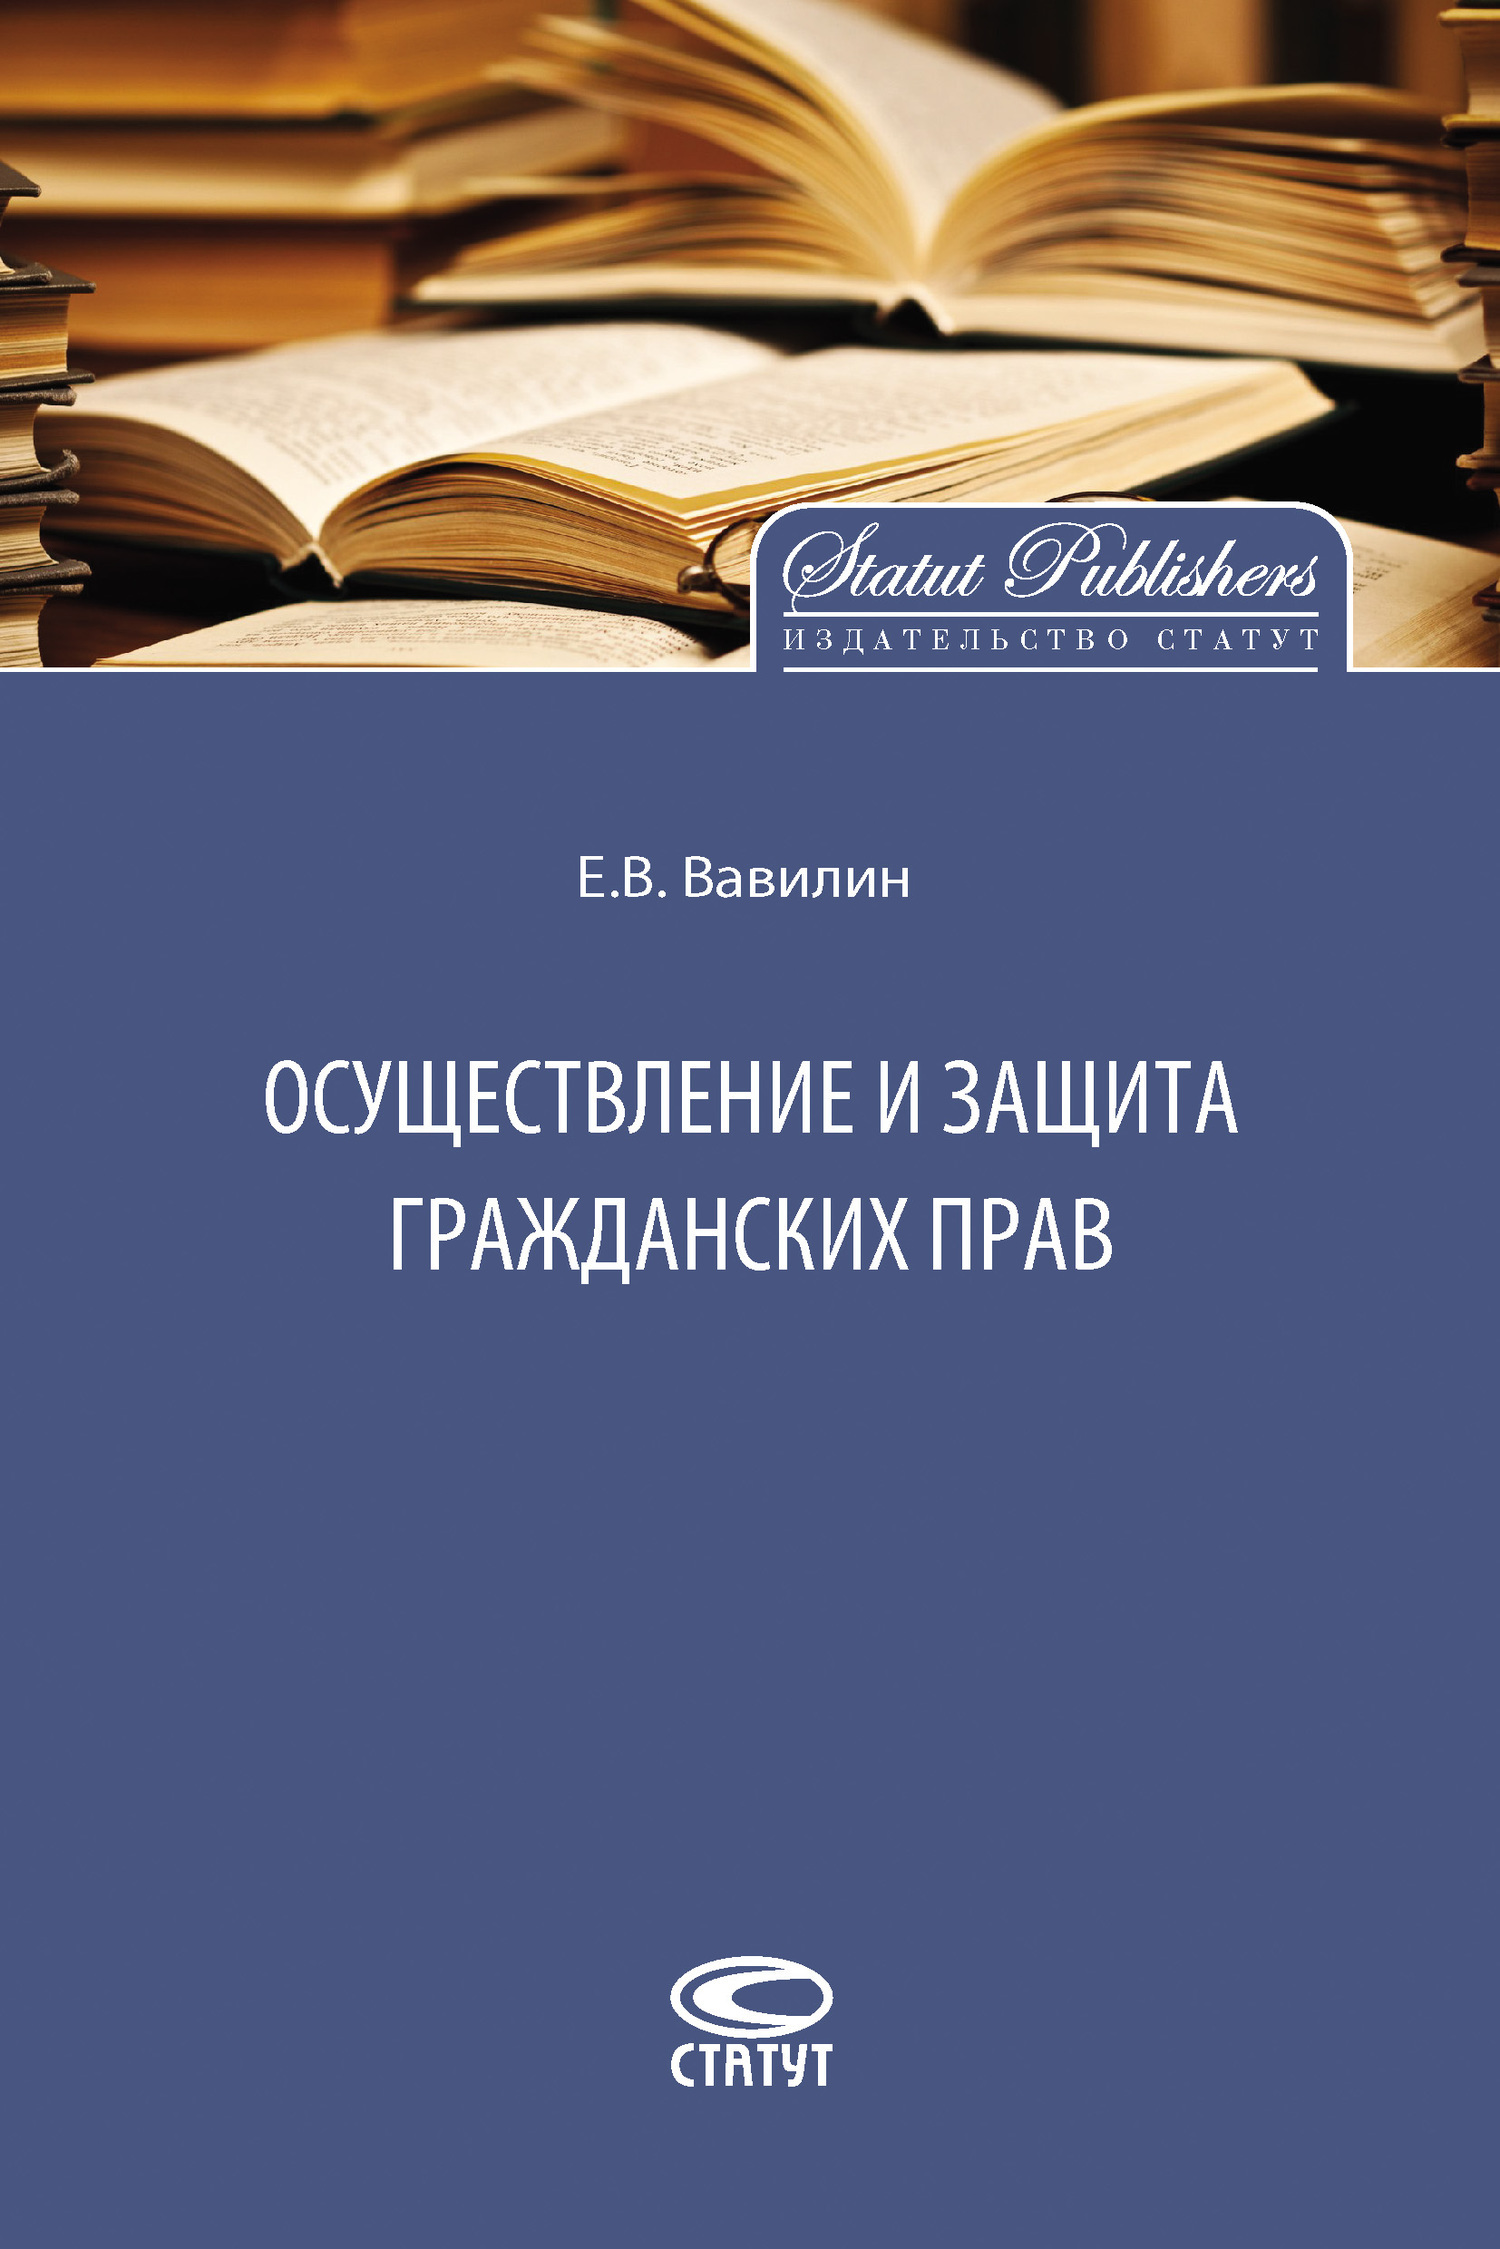 цена на Е. В. Вавилин Осуществление и защита гражданских прав